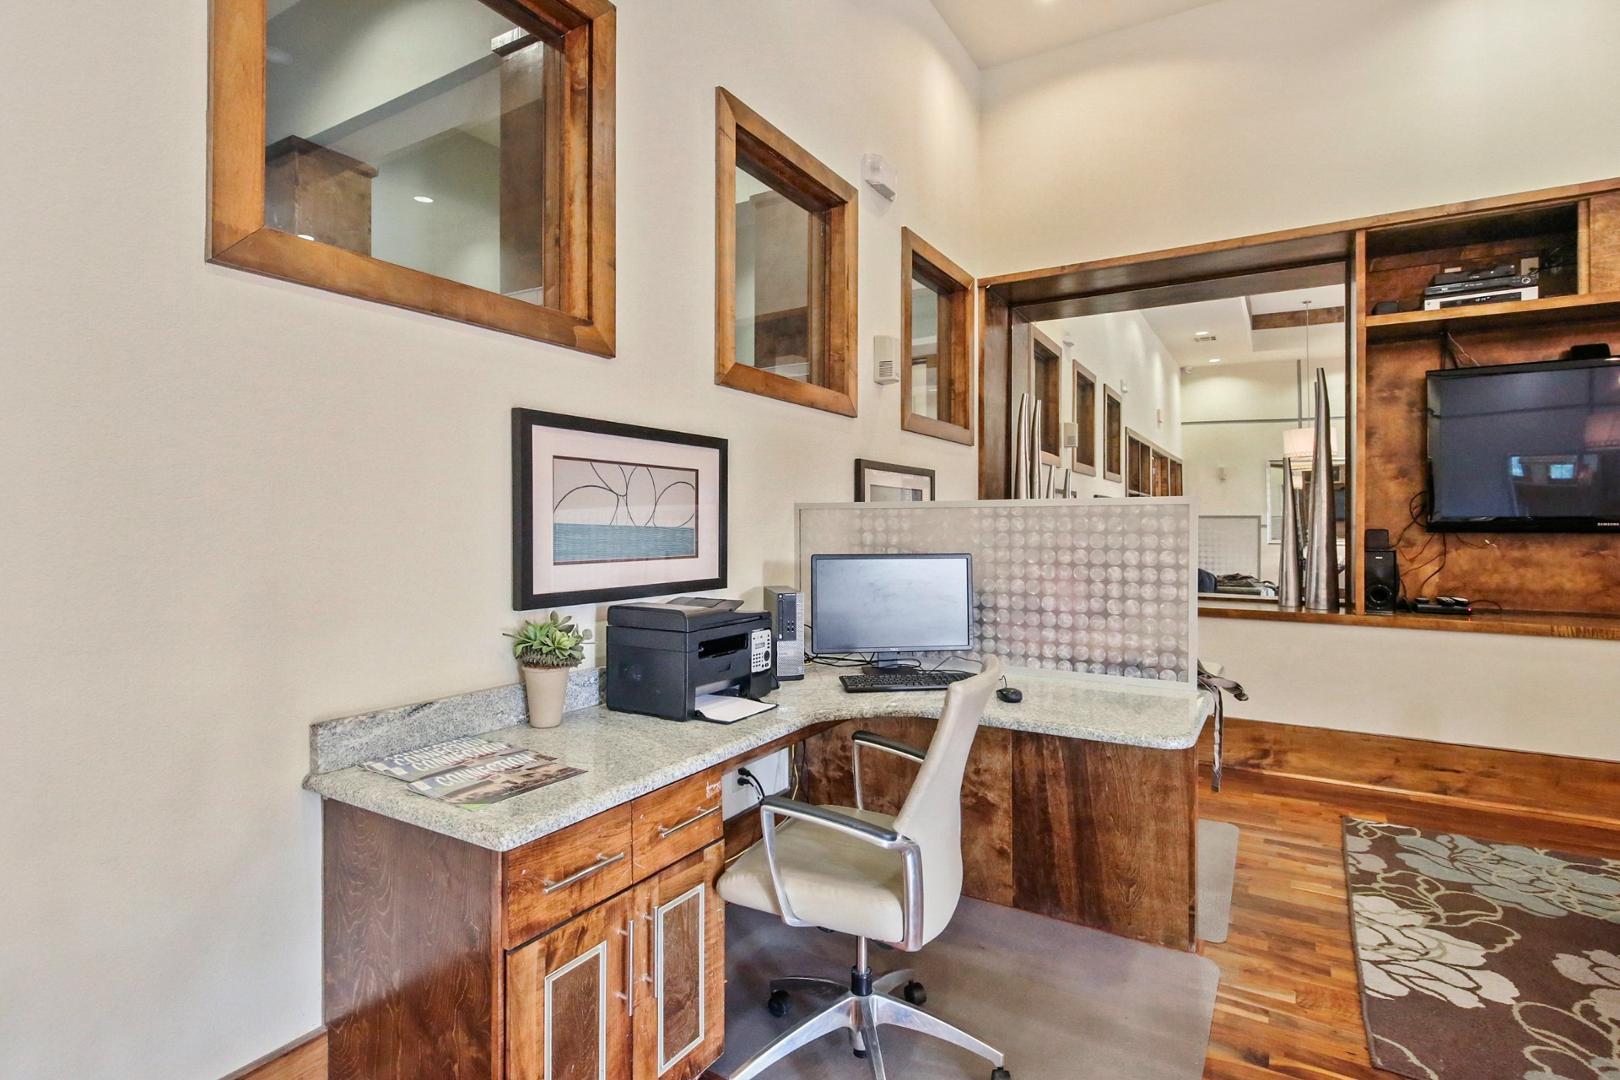 600 Woodbridge Parkway #2332, Wylie, TX - 1,880 USD/ month